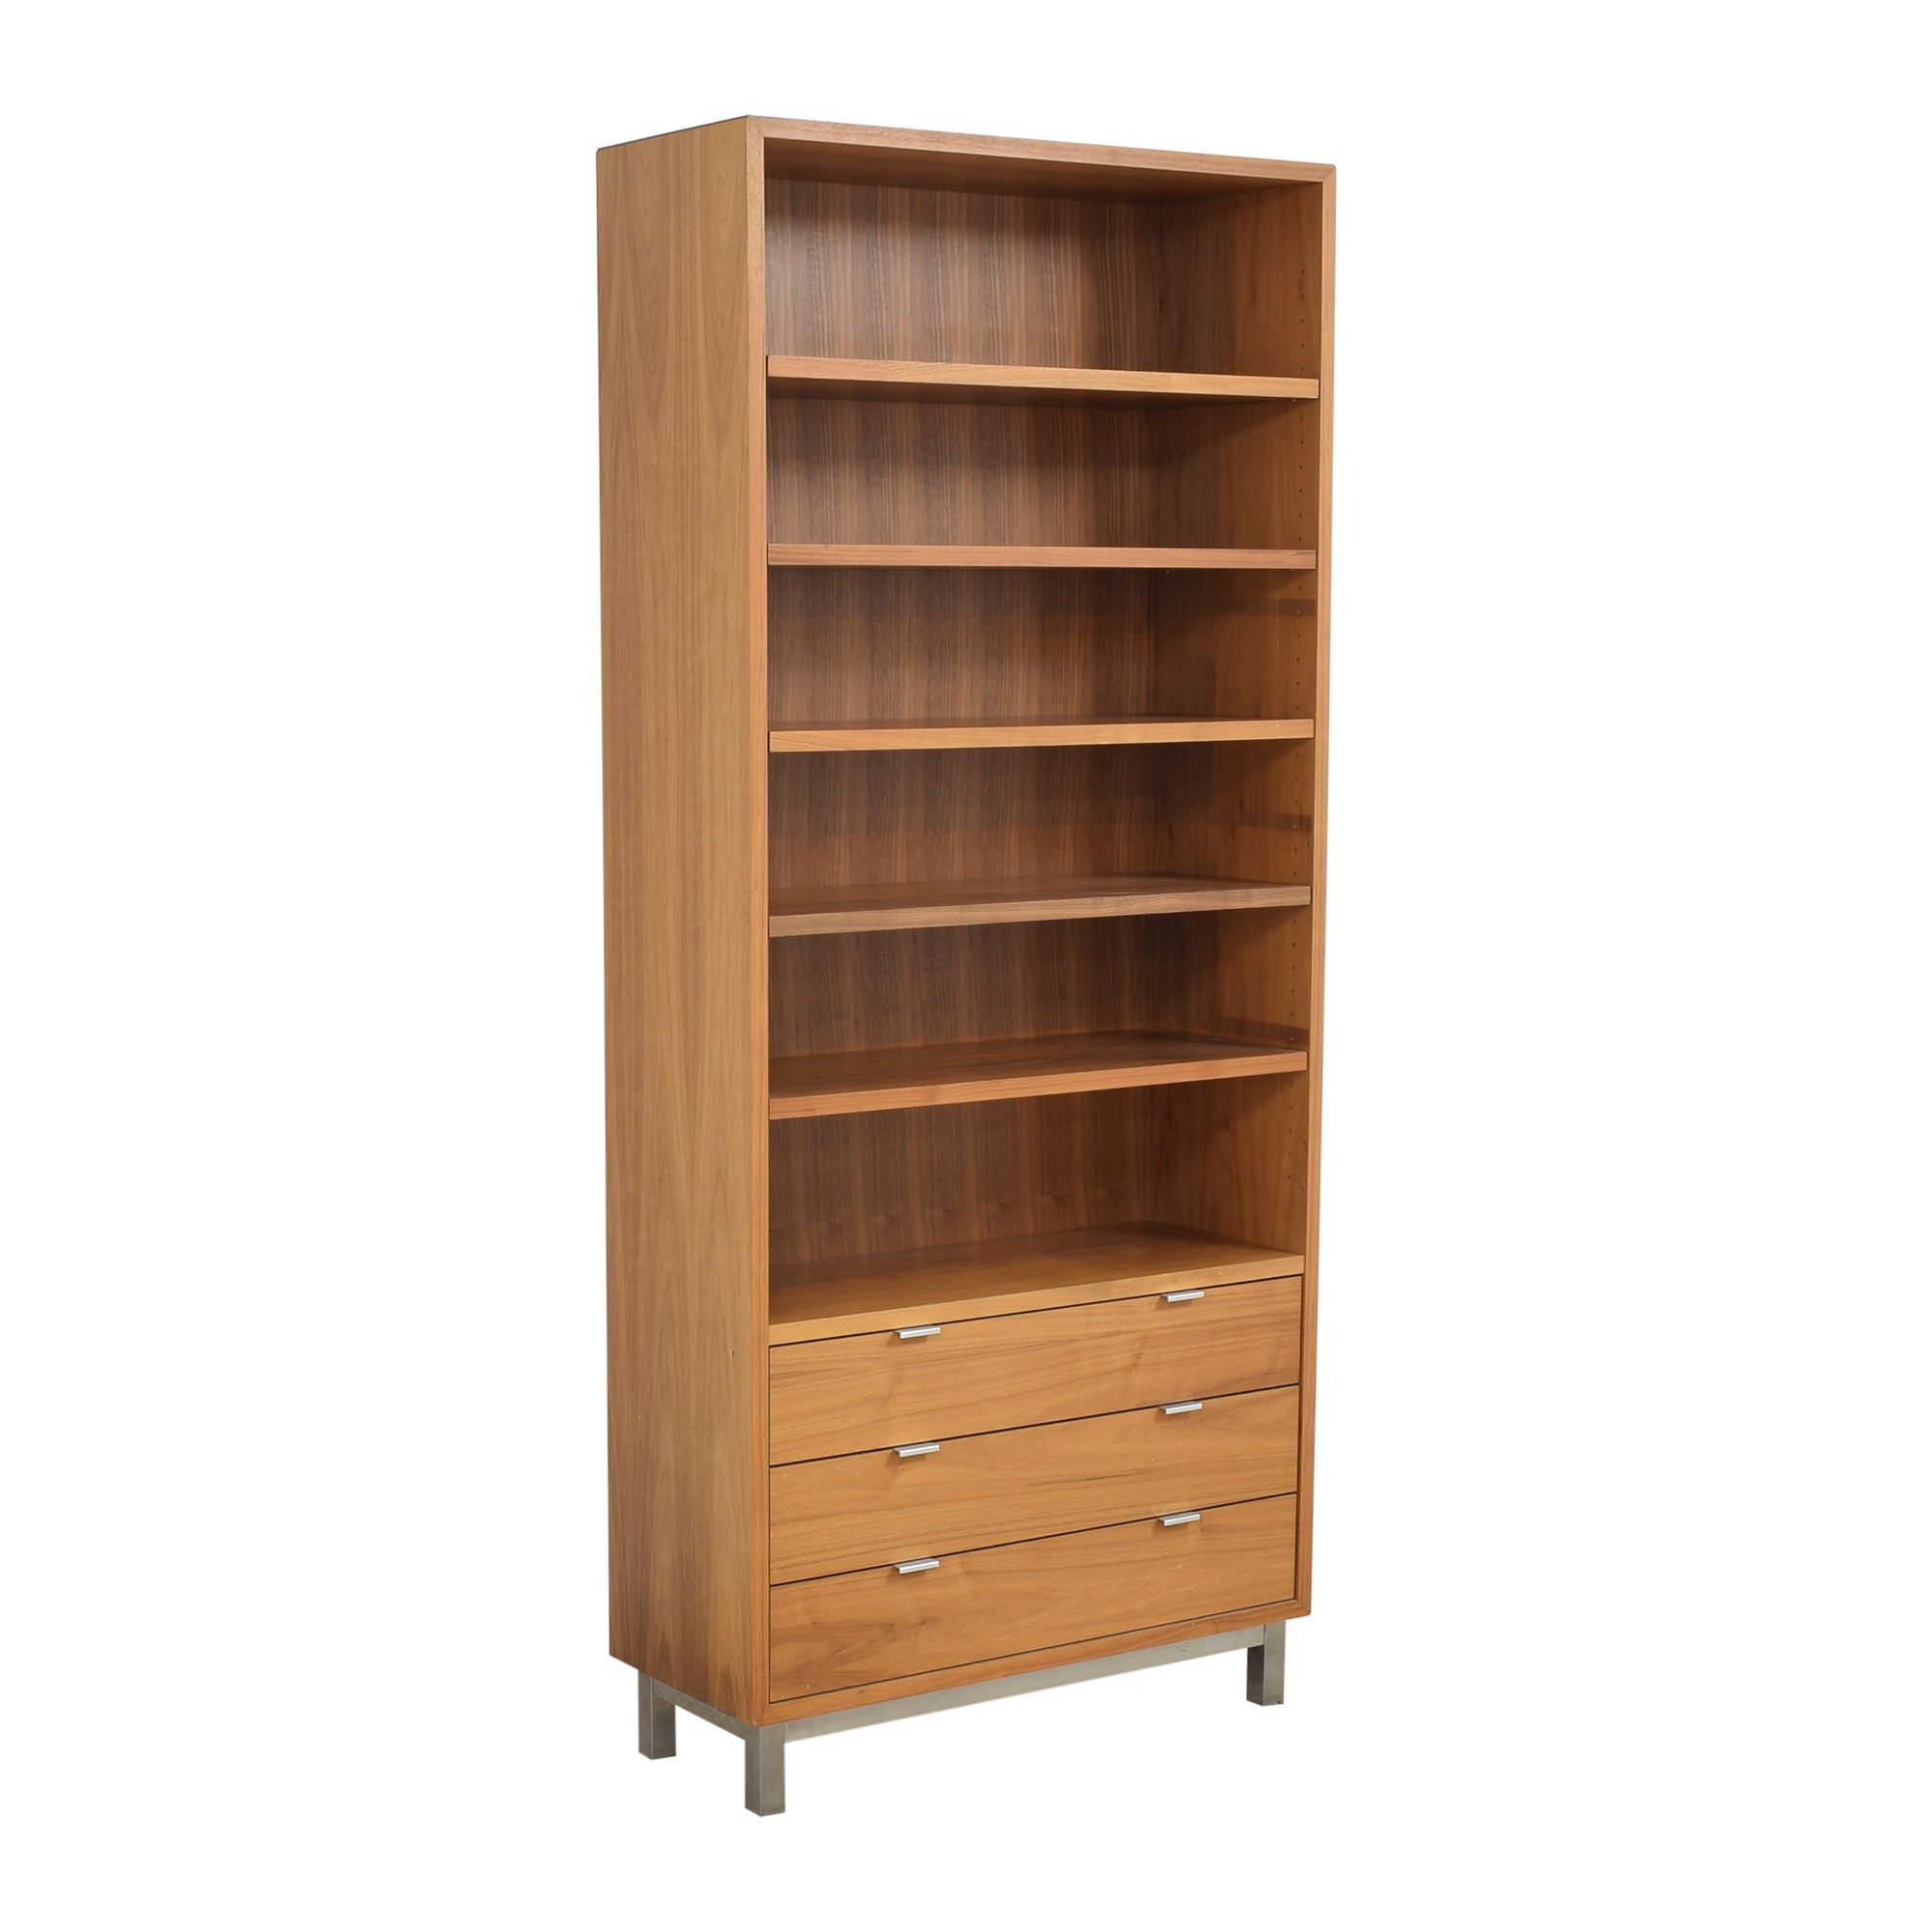 Room & Board Room & Board Copenhagen Three Drawer Bookcase